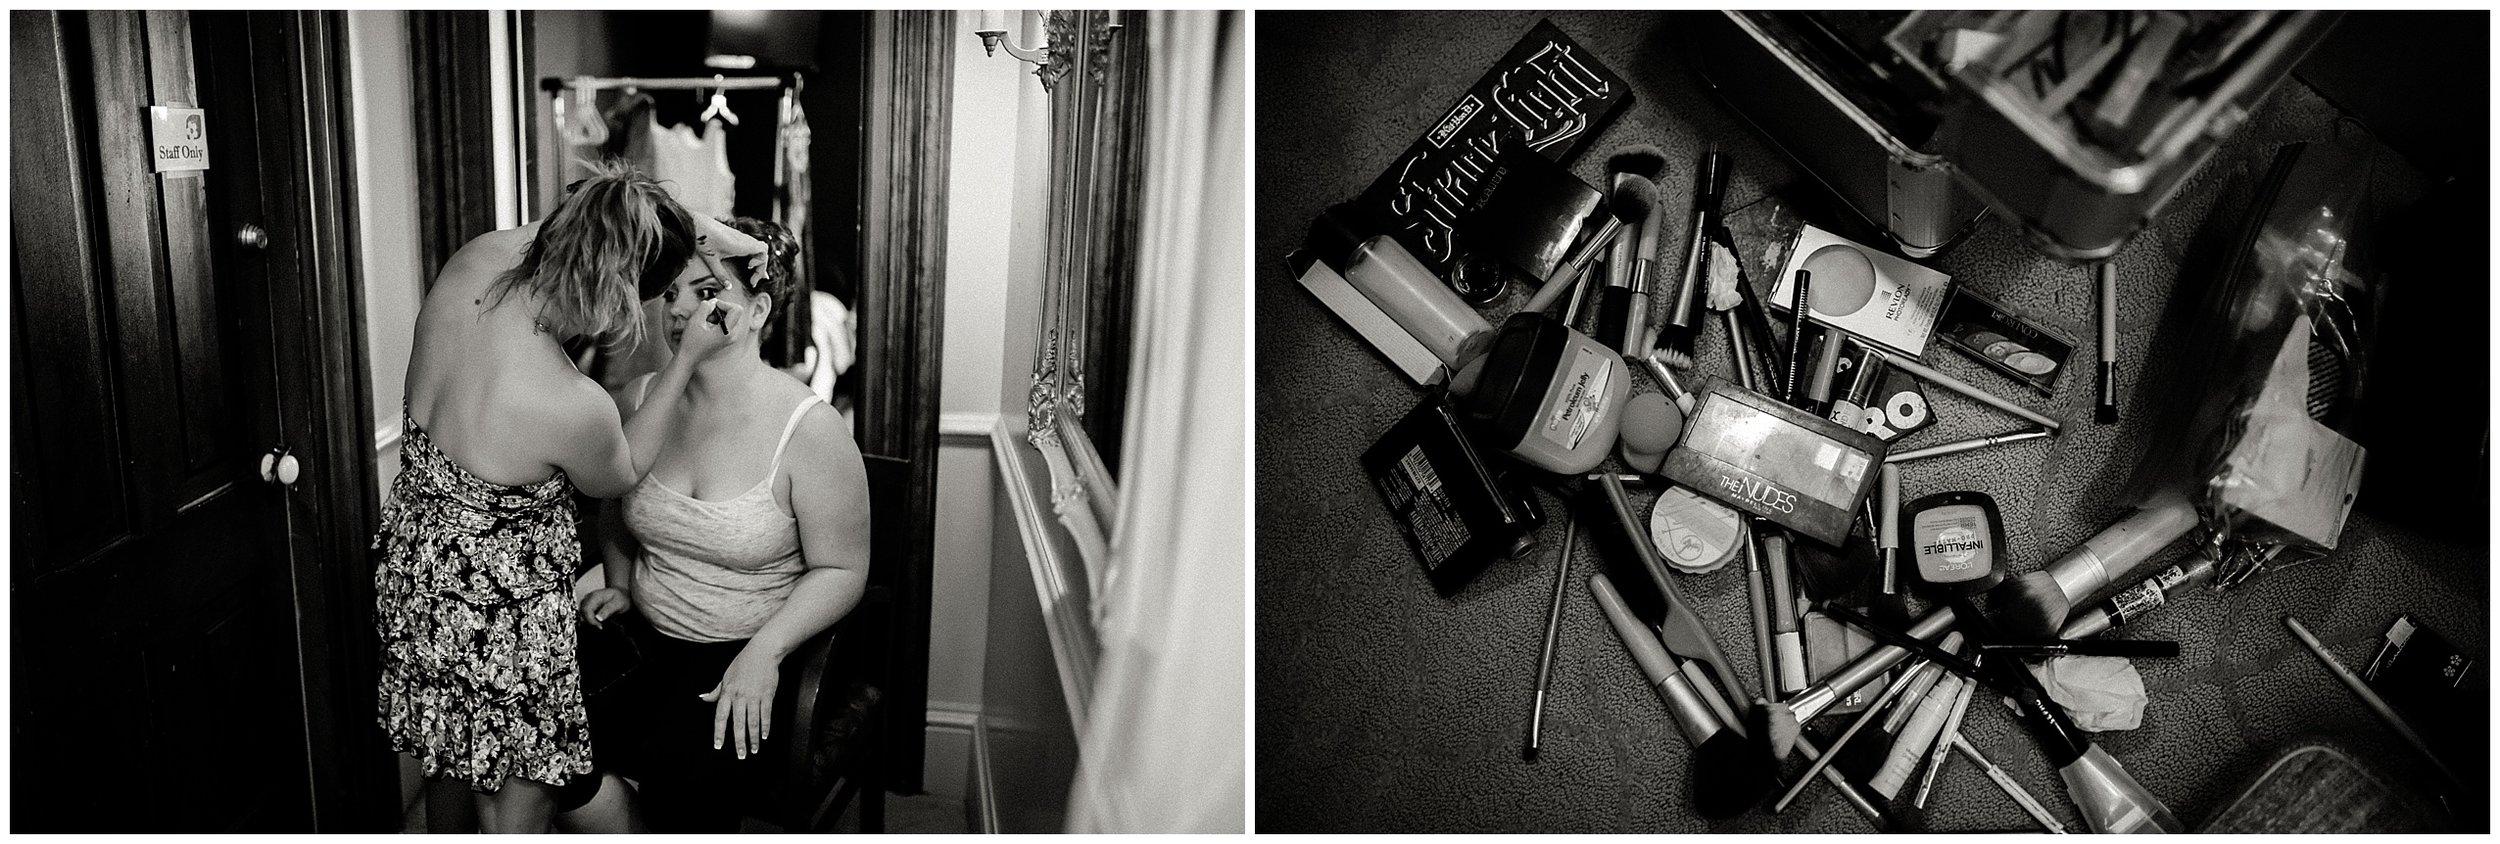 Micheal + Chelsie   Just Married #kyleepaigephotography_1562.jpg